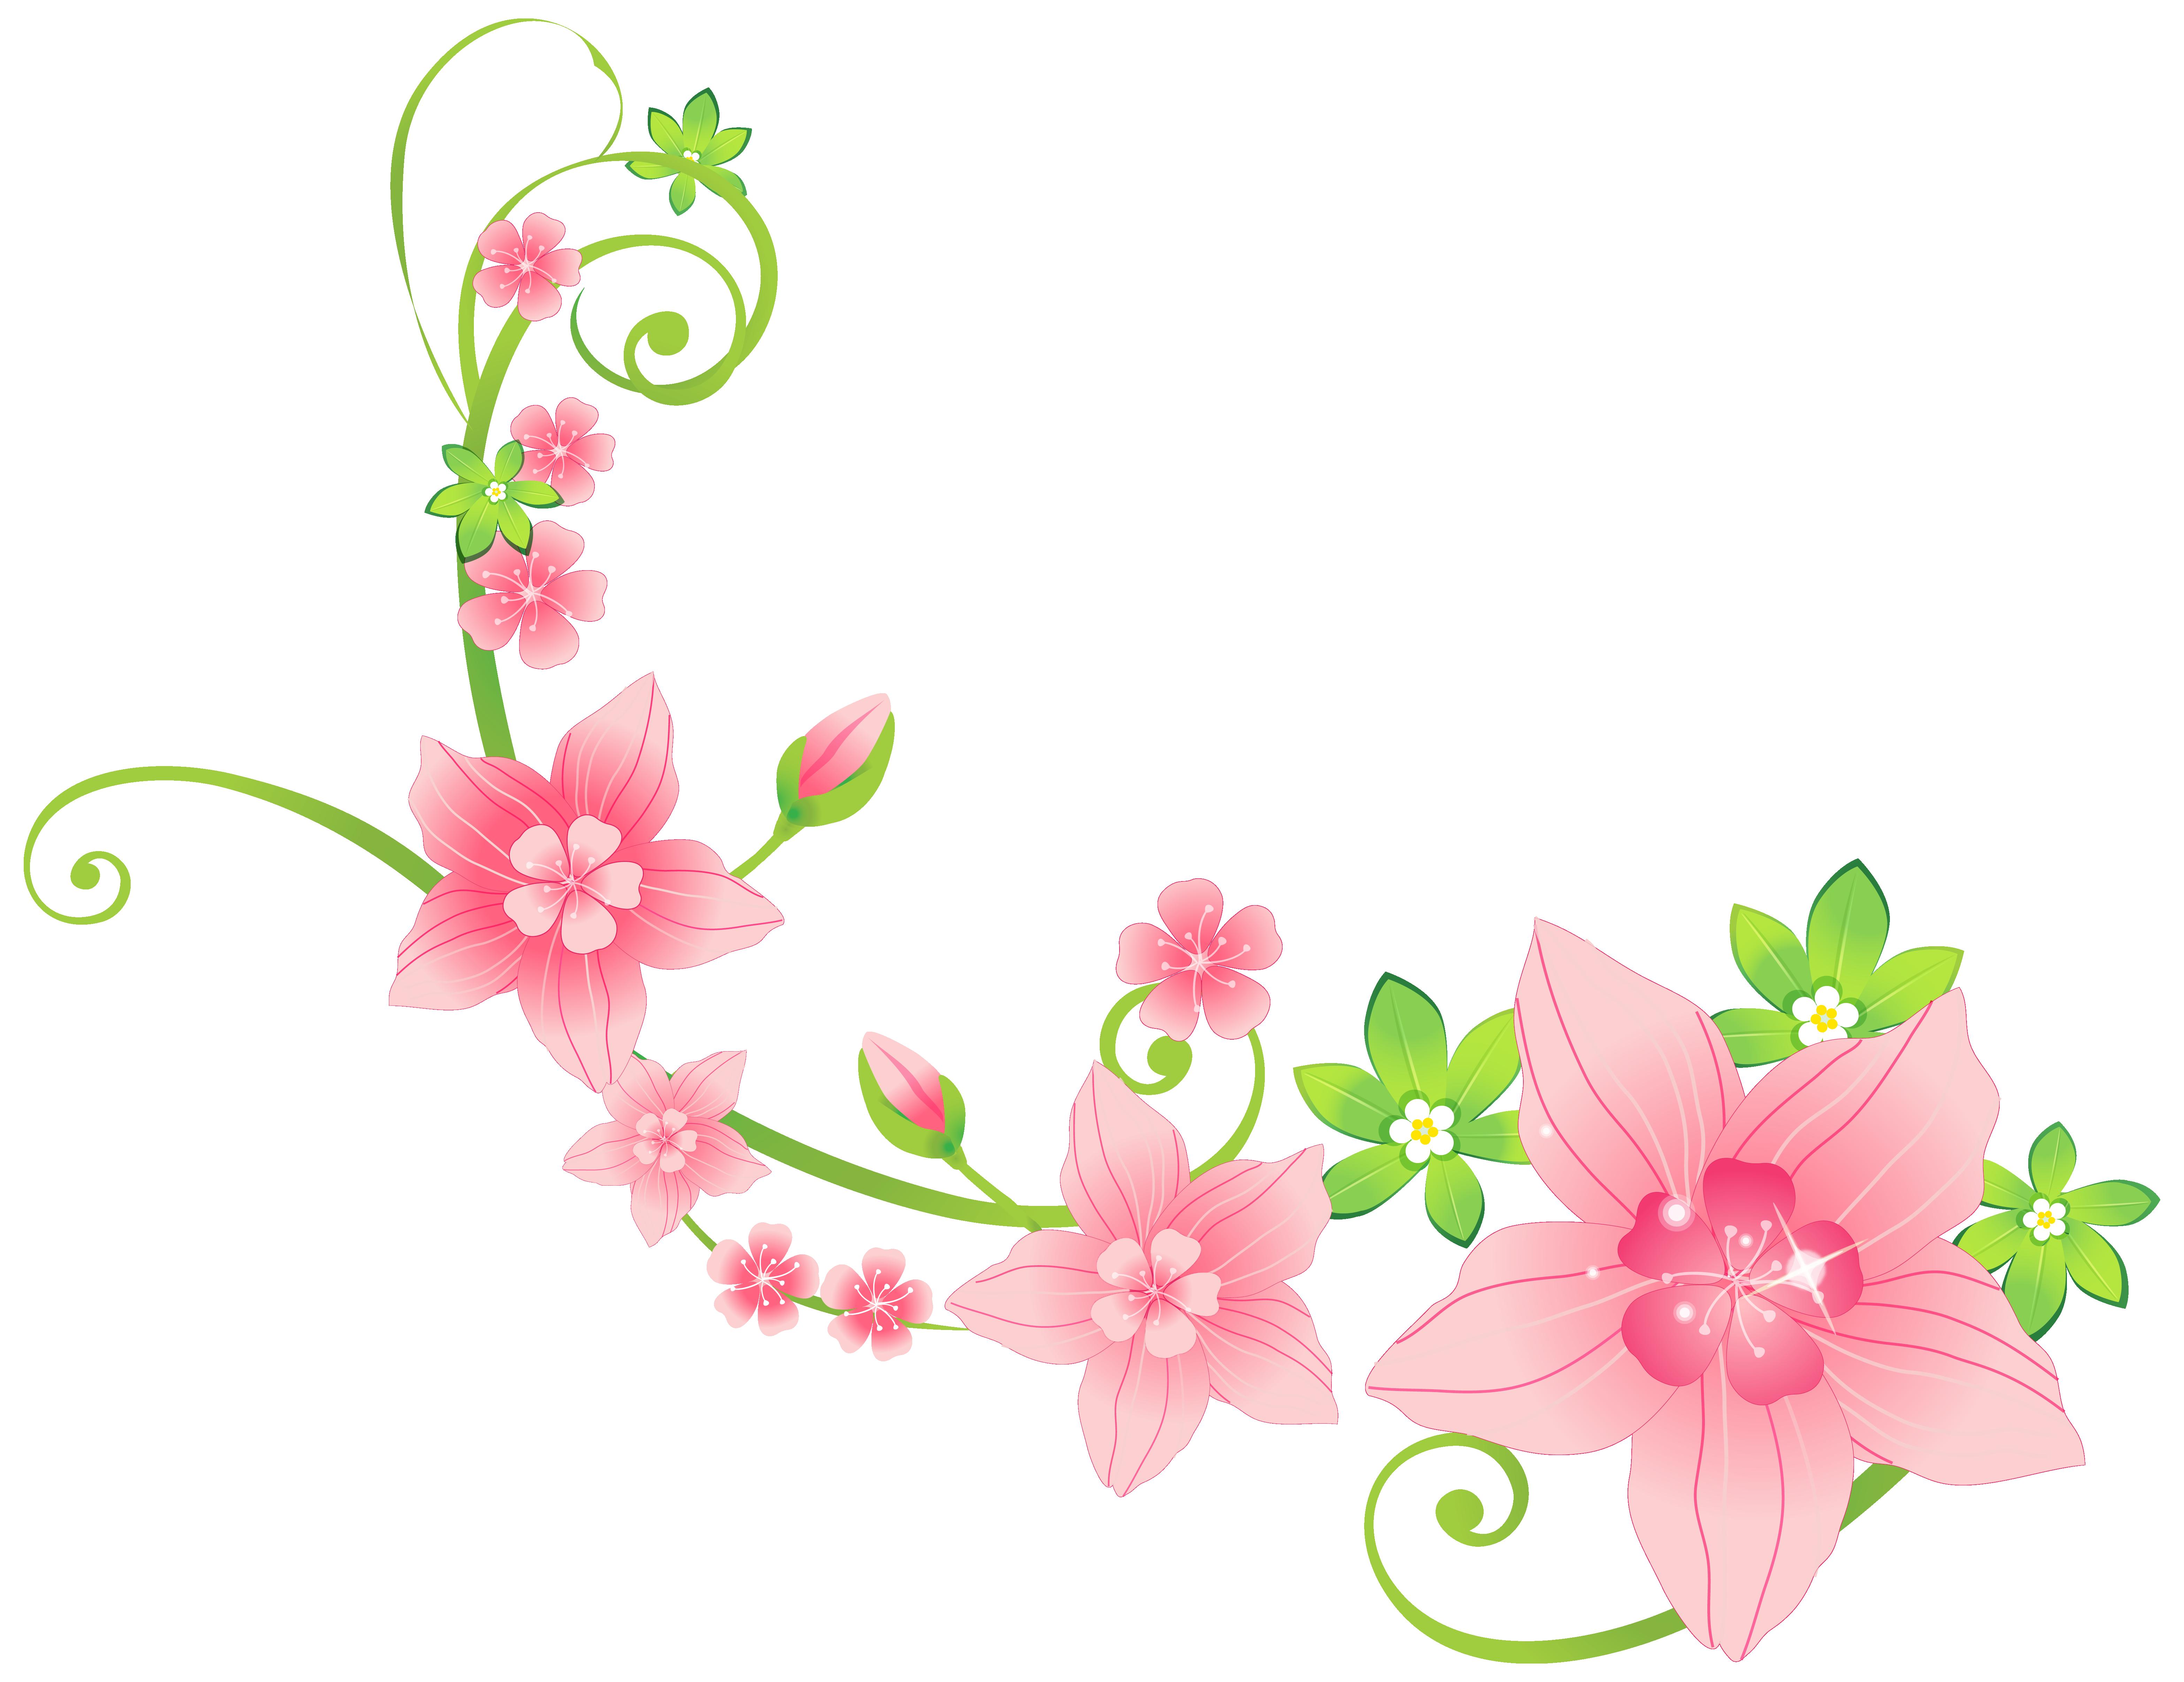 Floral images clipart jpg freeuse download Pink Floral Decoration PNG Clip-Art Image | Gallery Yopriceville ... jpg freeuse download